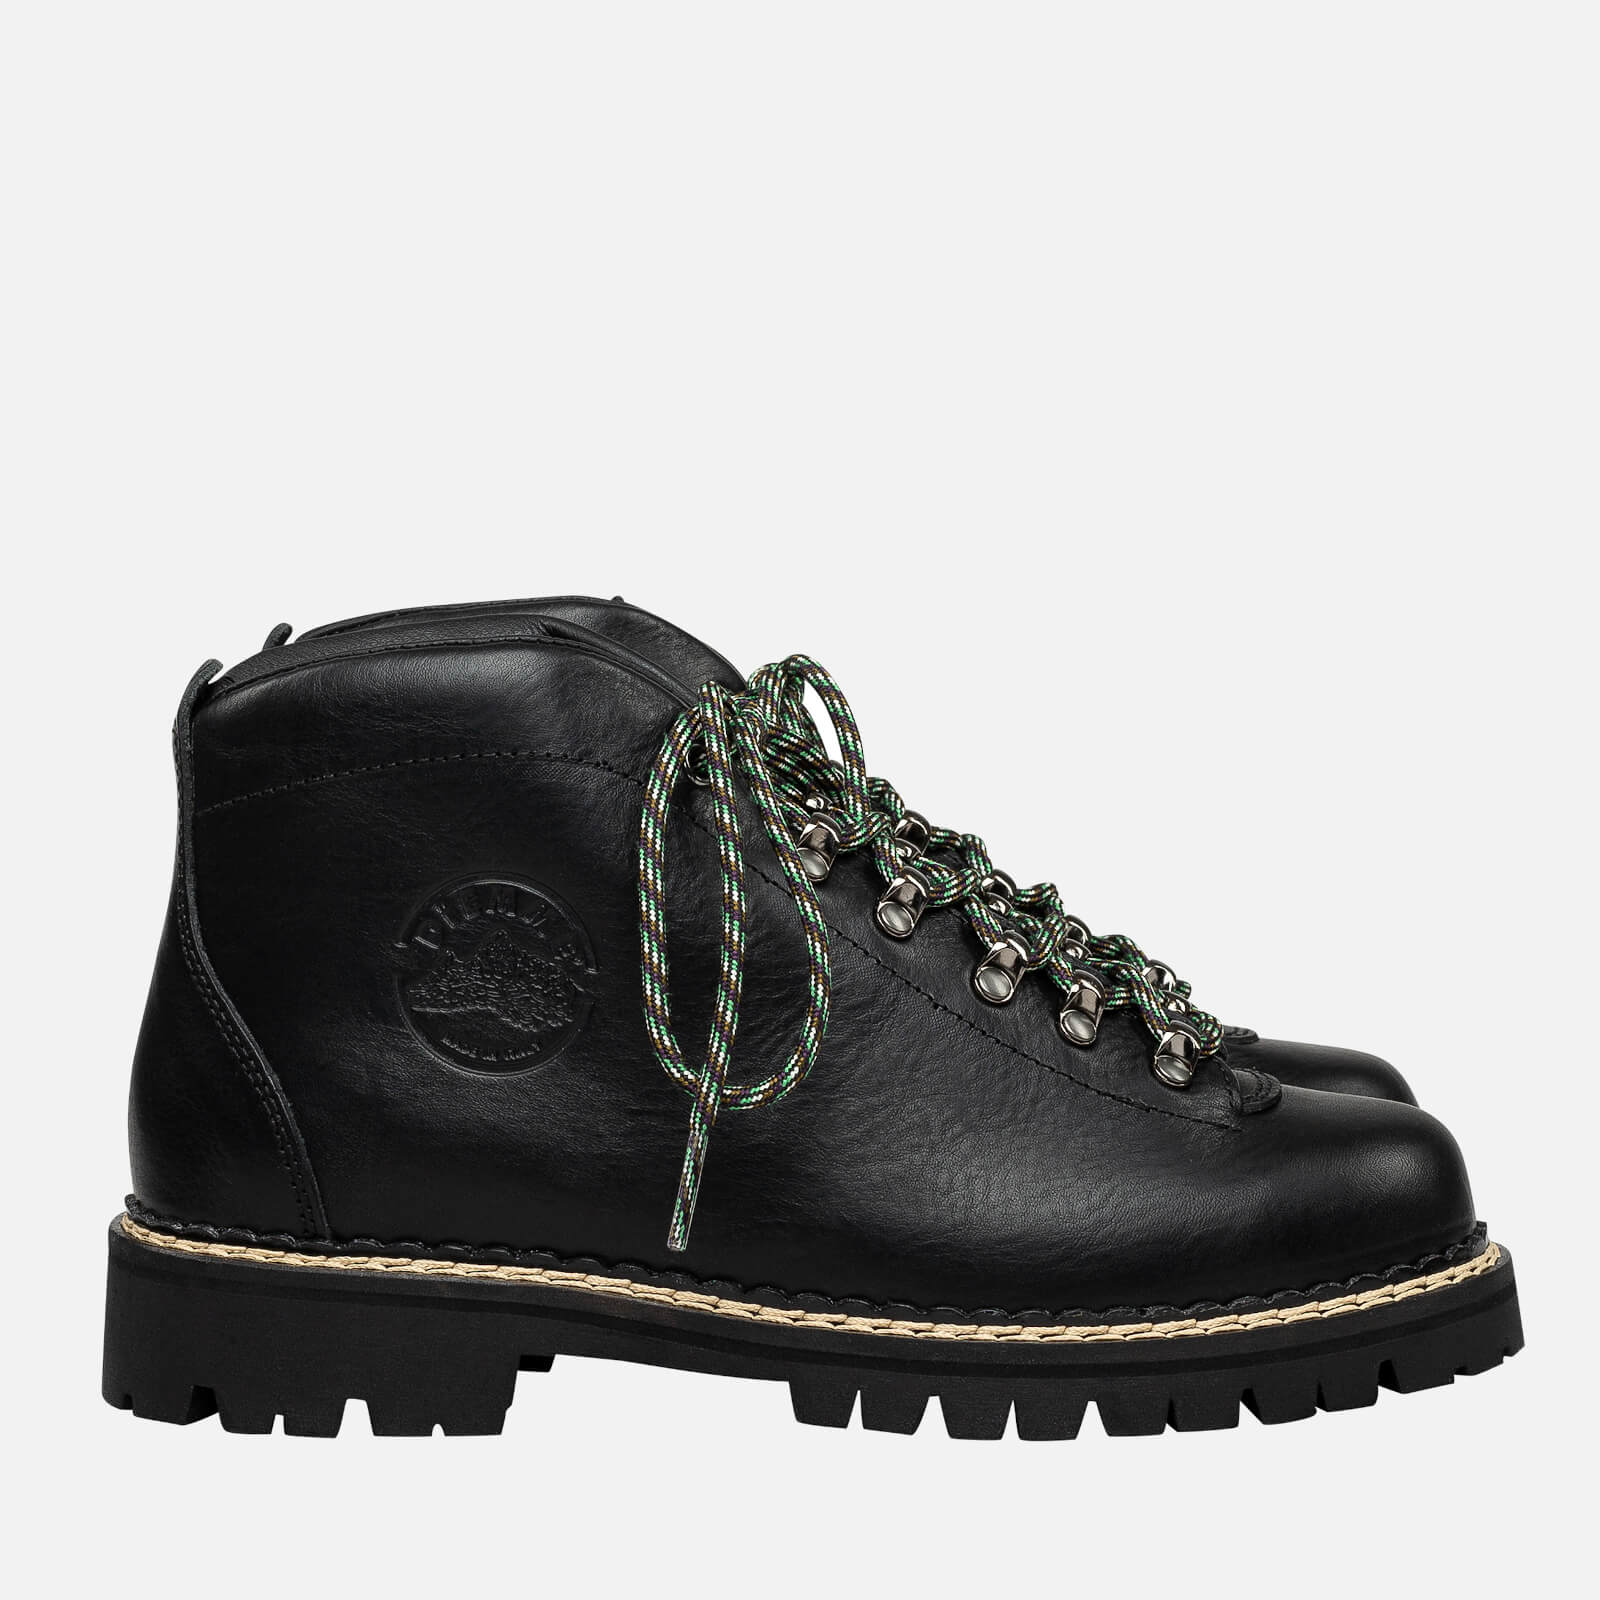 Diemme Women's Tirol Leather Hiking Style Boots - Black - Uk 3/Eu 35